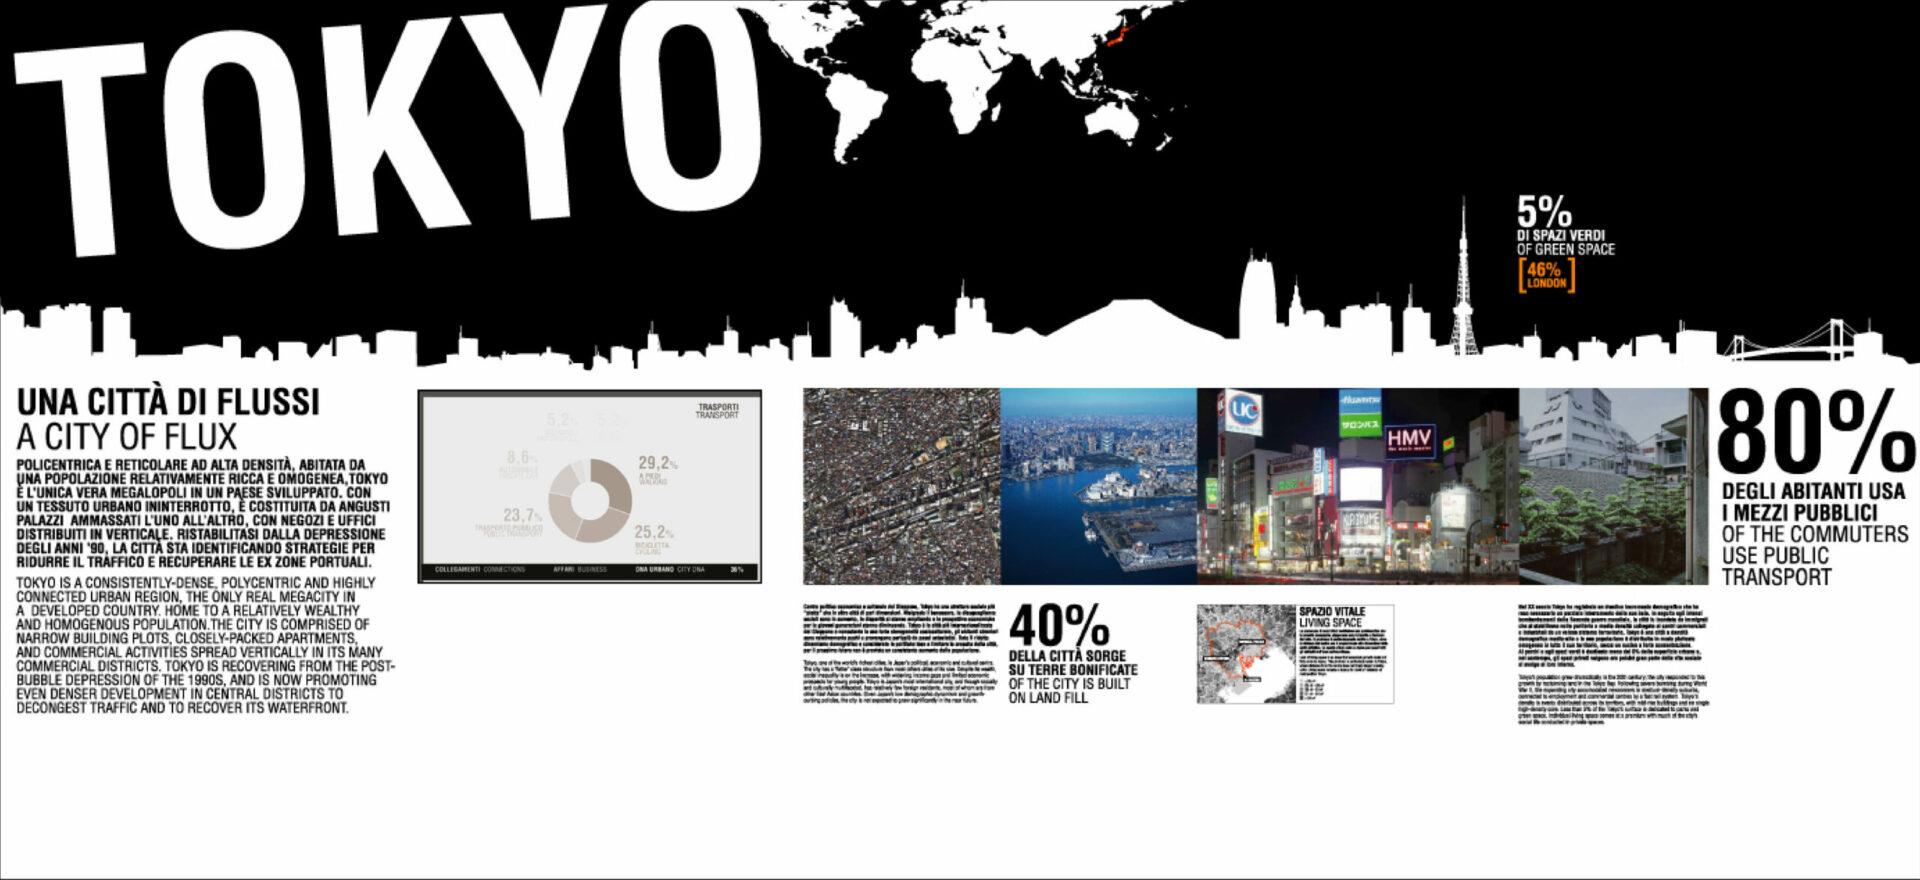 La Biennale di Venezia | Urban Design | Exhibition Design | Cities as models of sustainability | Mario Trimarchi Design | Fragile